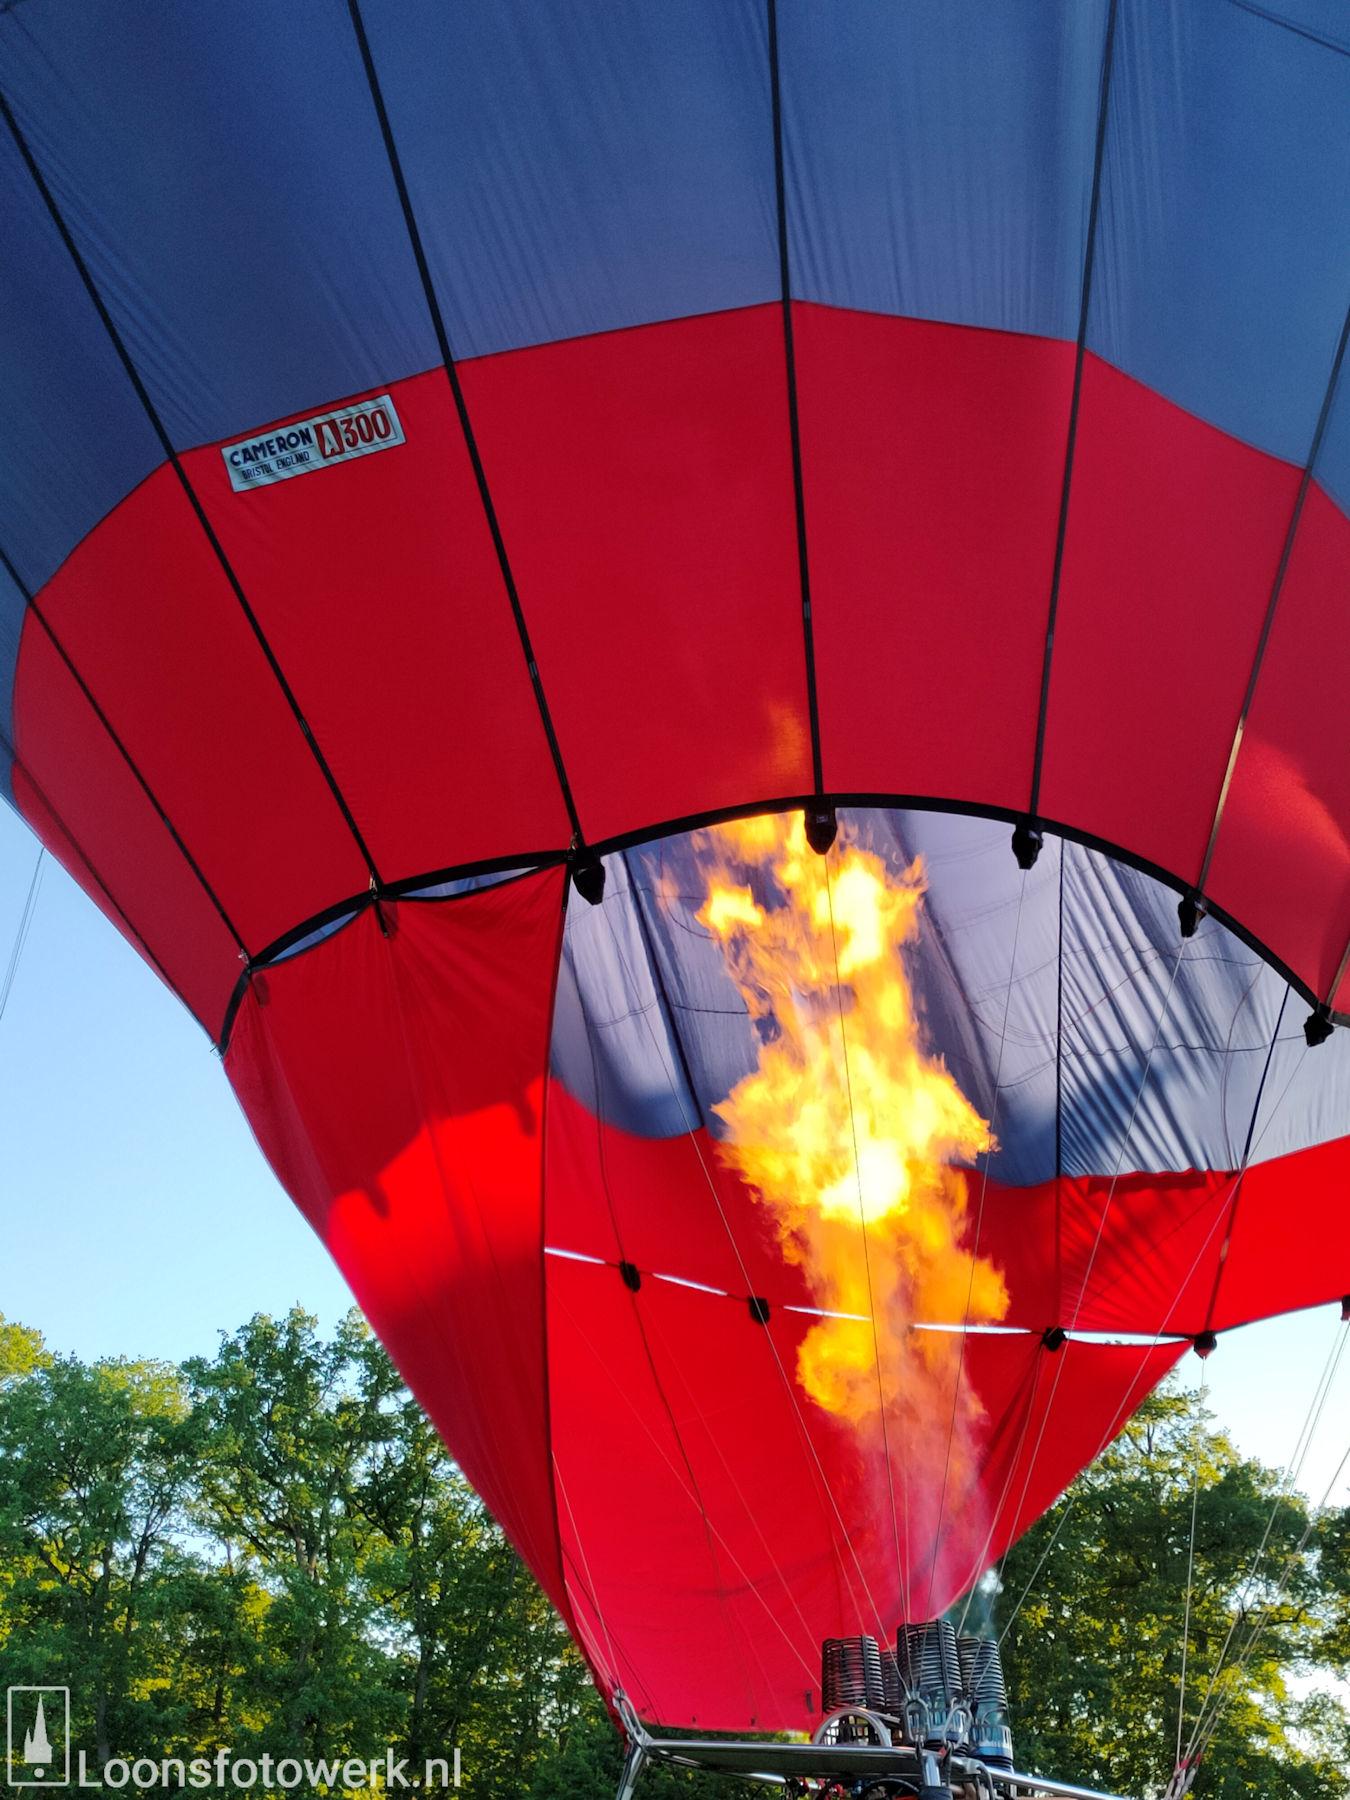 Ballonvaart vanaf de Kasteelweide 23